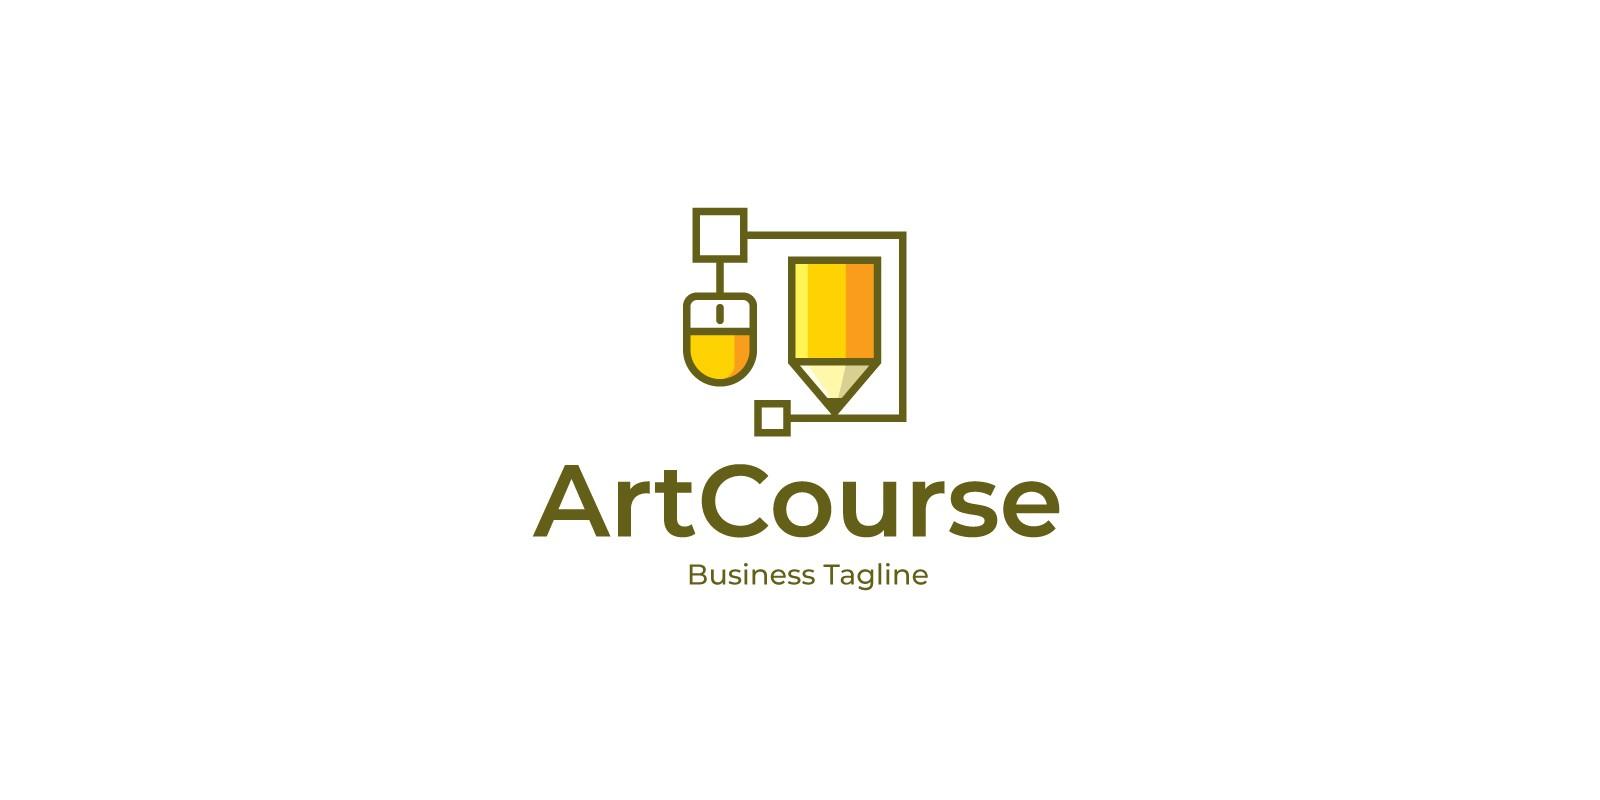 Graphic Design Course Logo Template